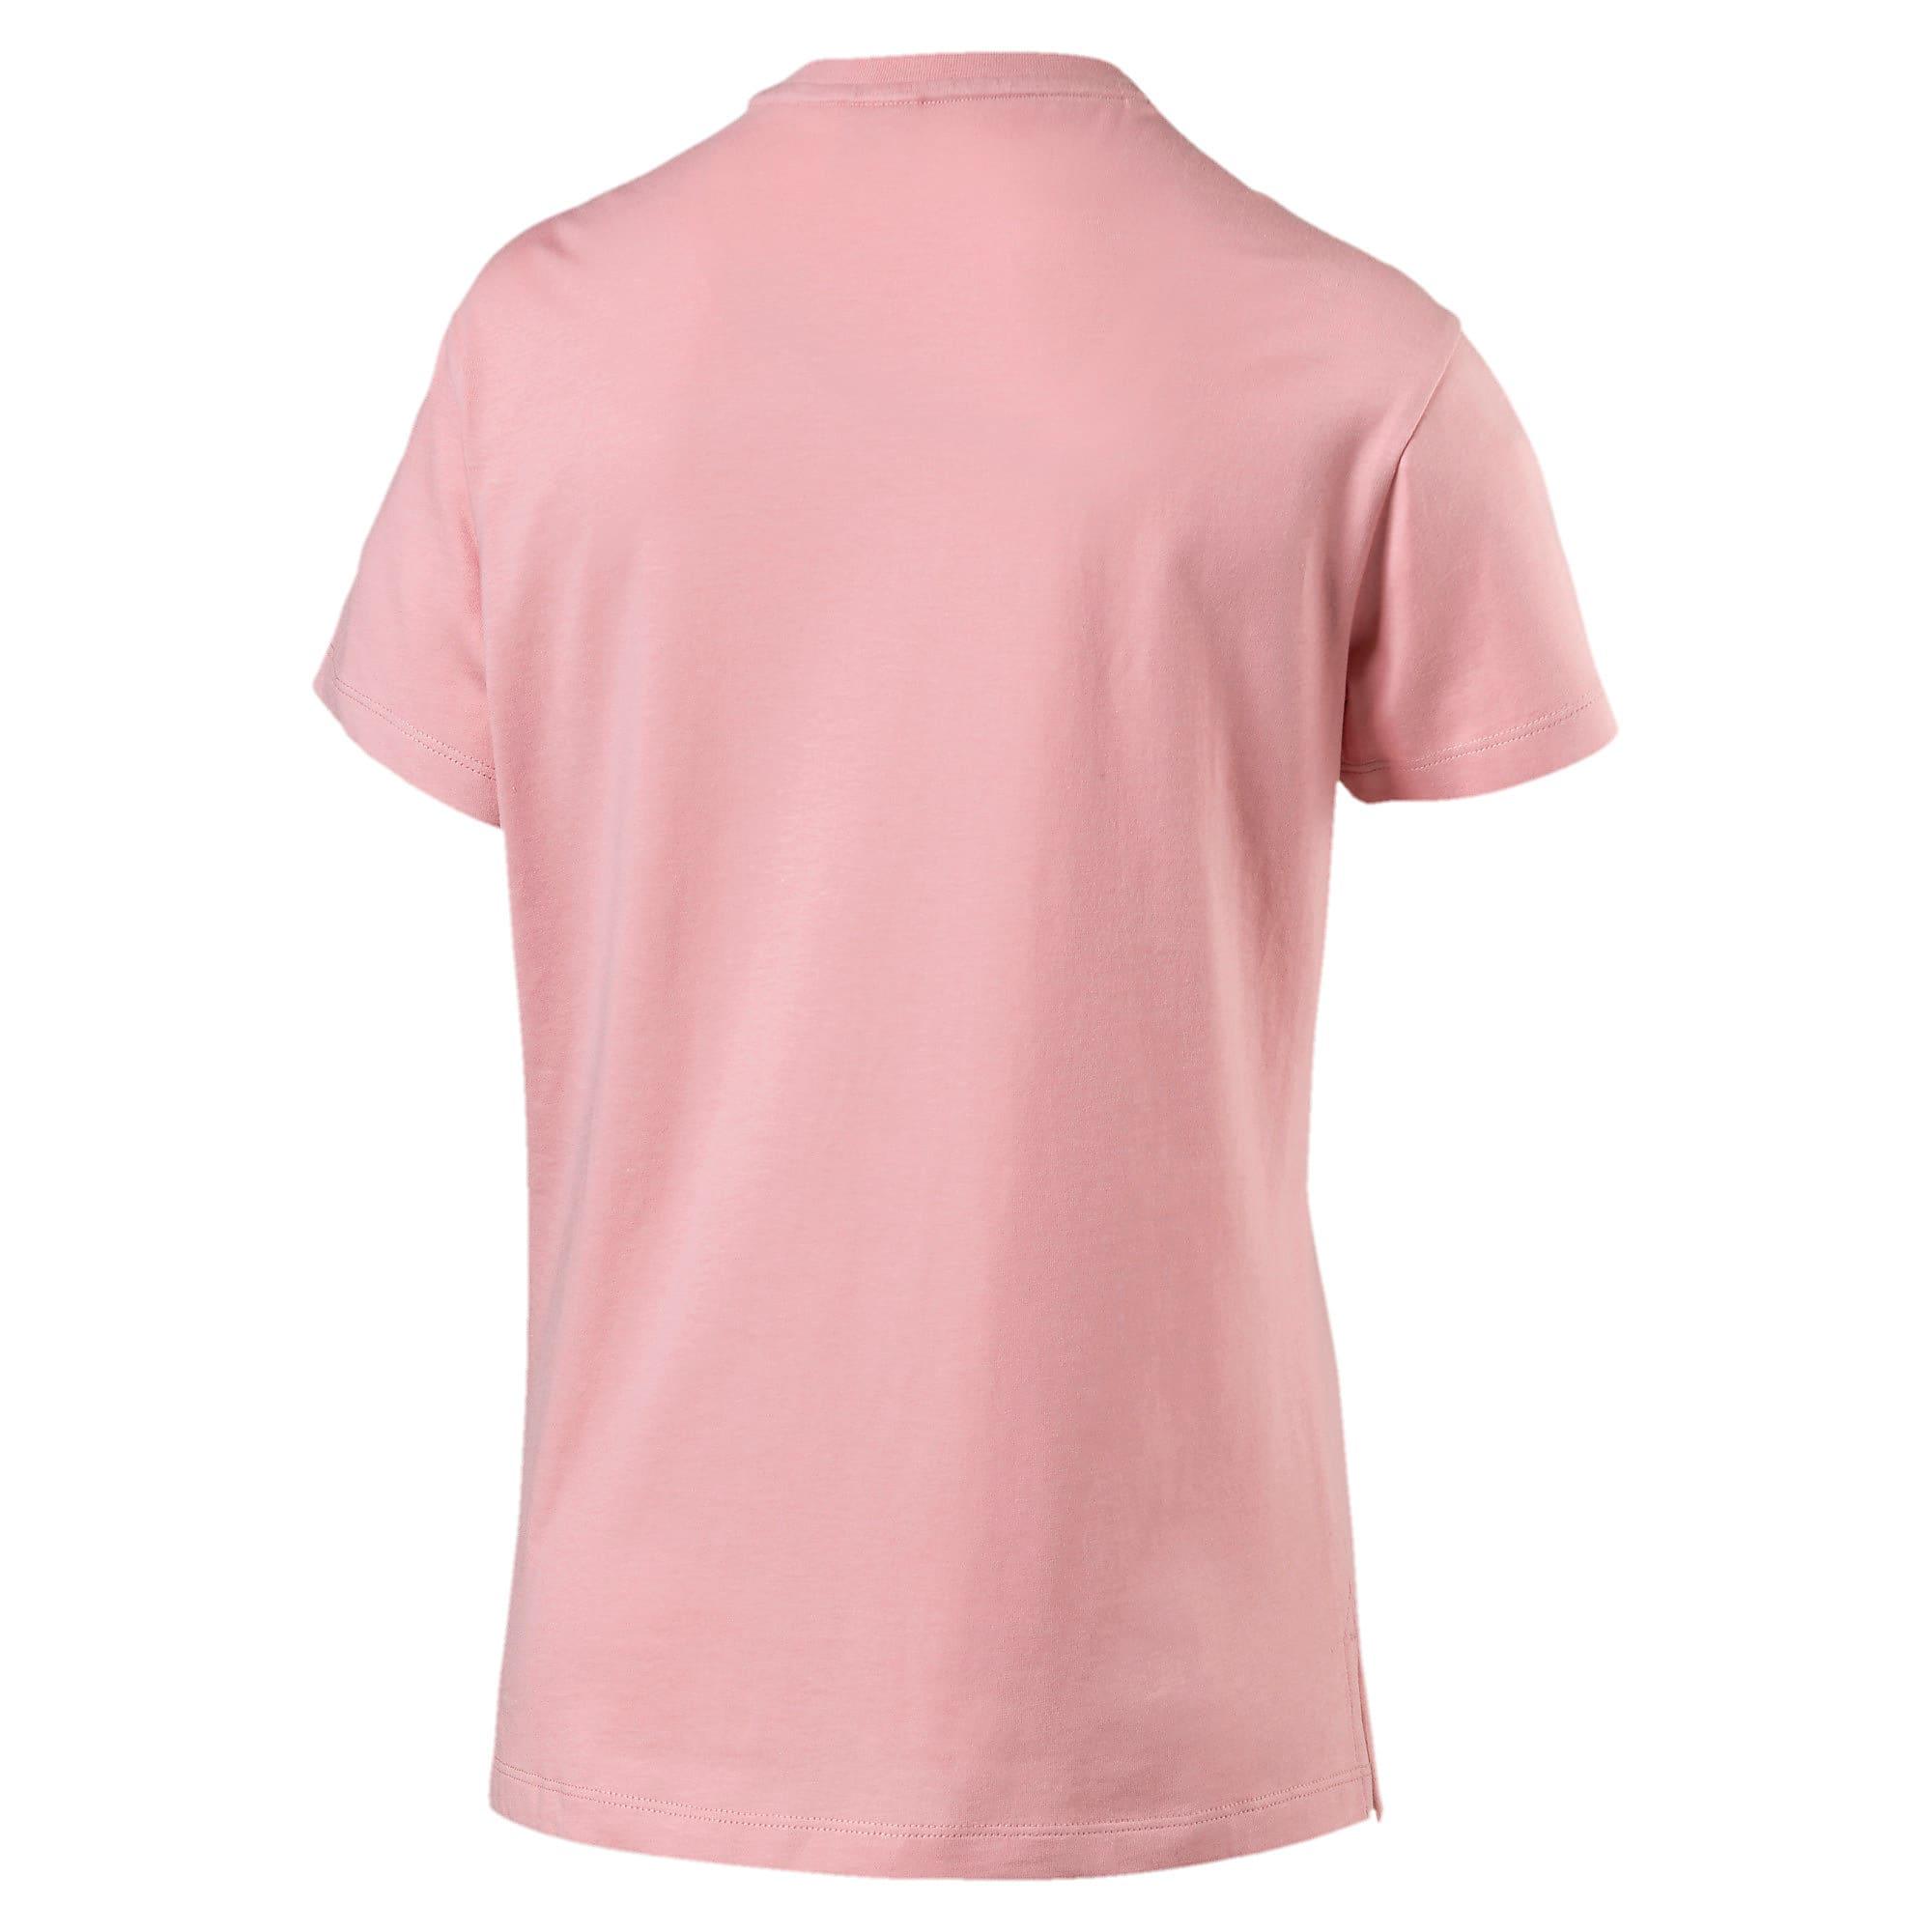 Thumbnail 3 of CLOUD パック ウィメンズ グラフィック Tシャツ, Bridal Rose, medium-JPN